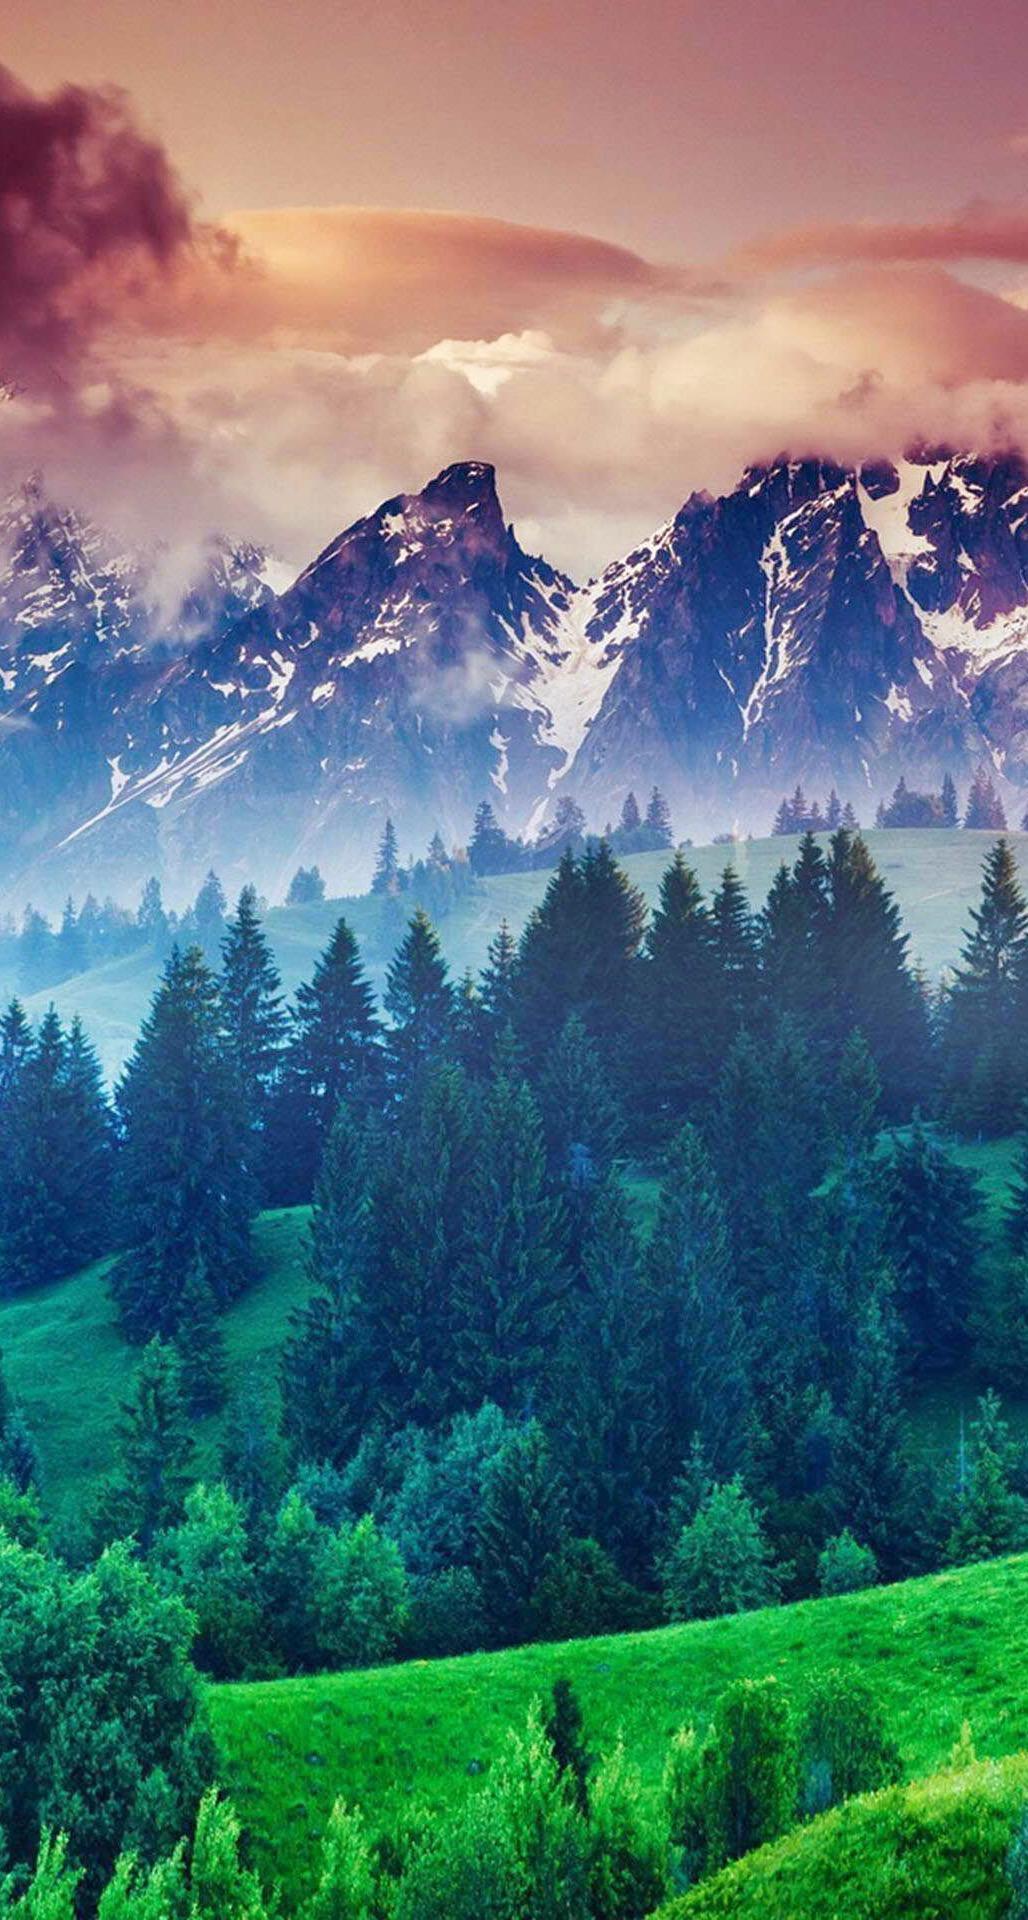 50+ iPhone 6 Wallpaper HD Forest on WallpaperSafari